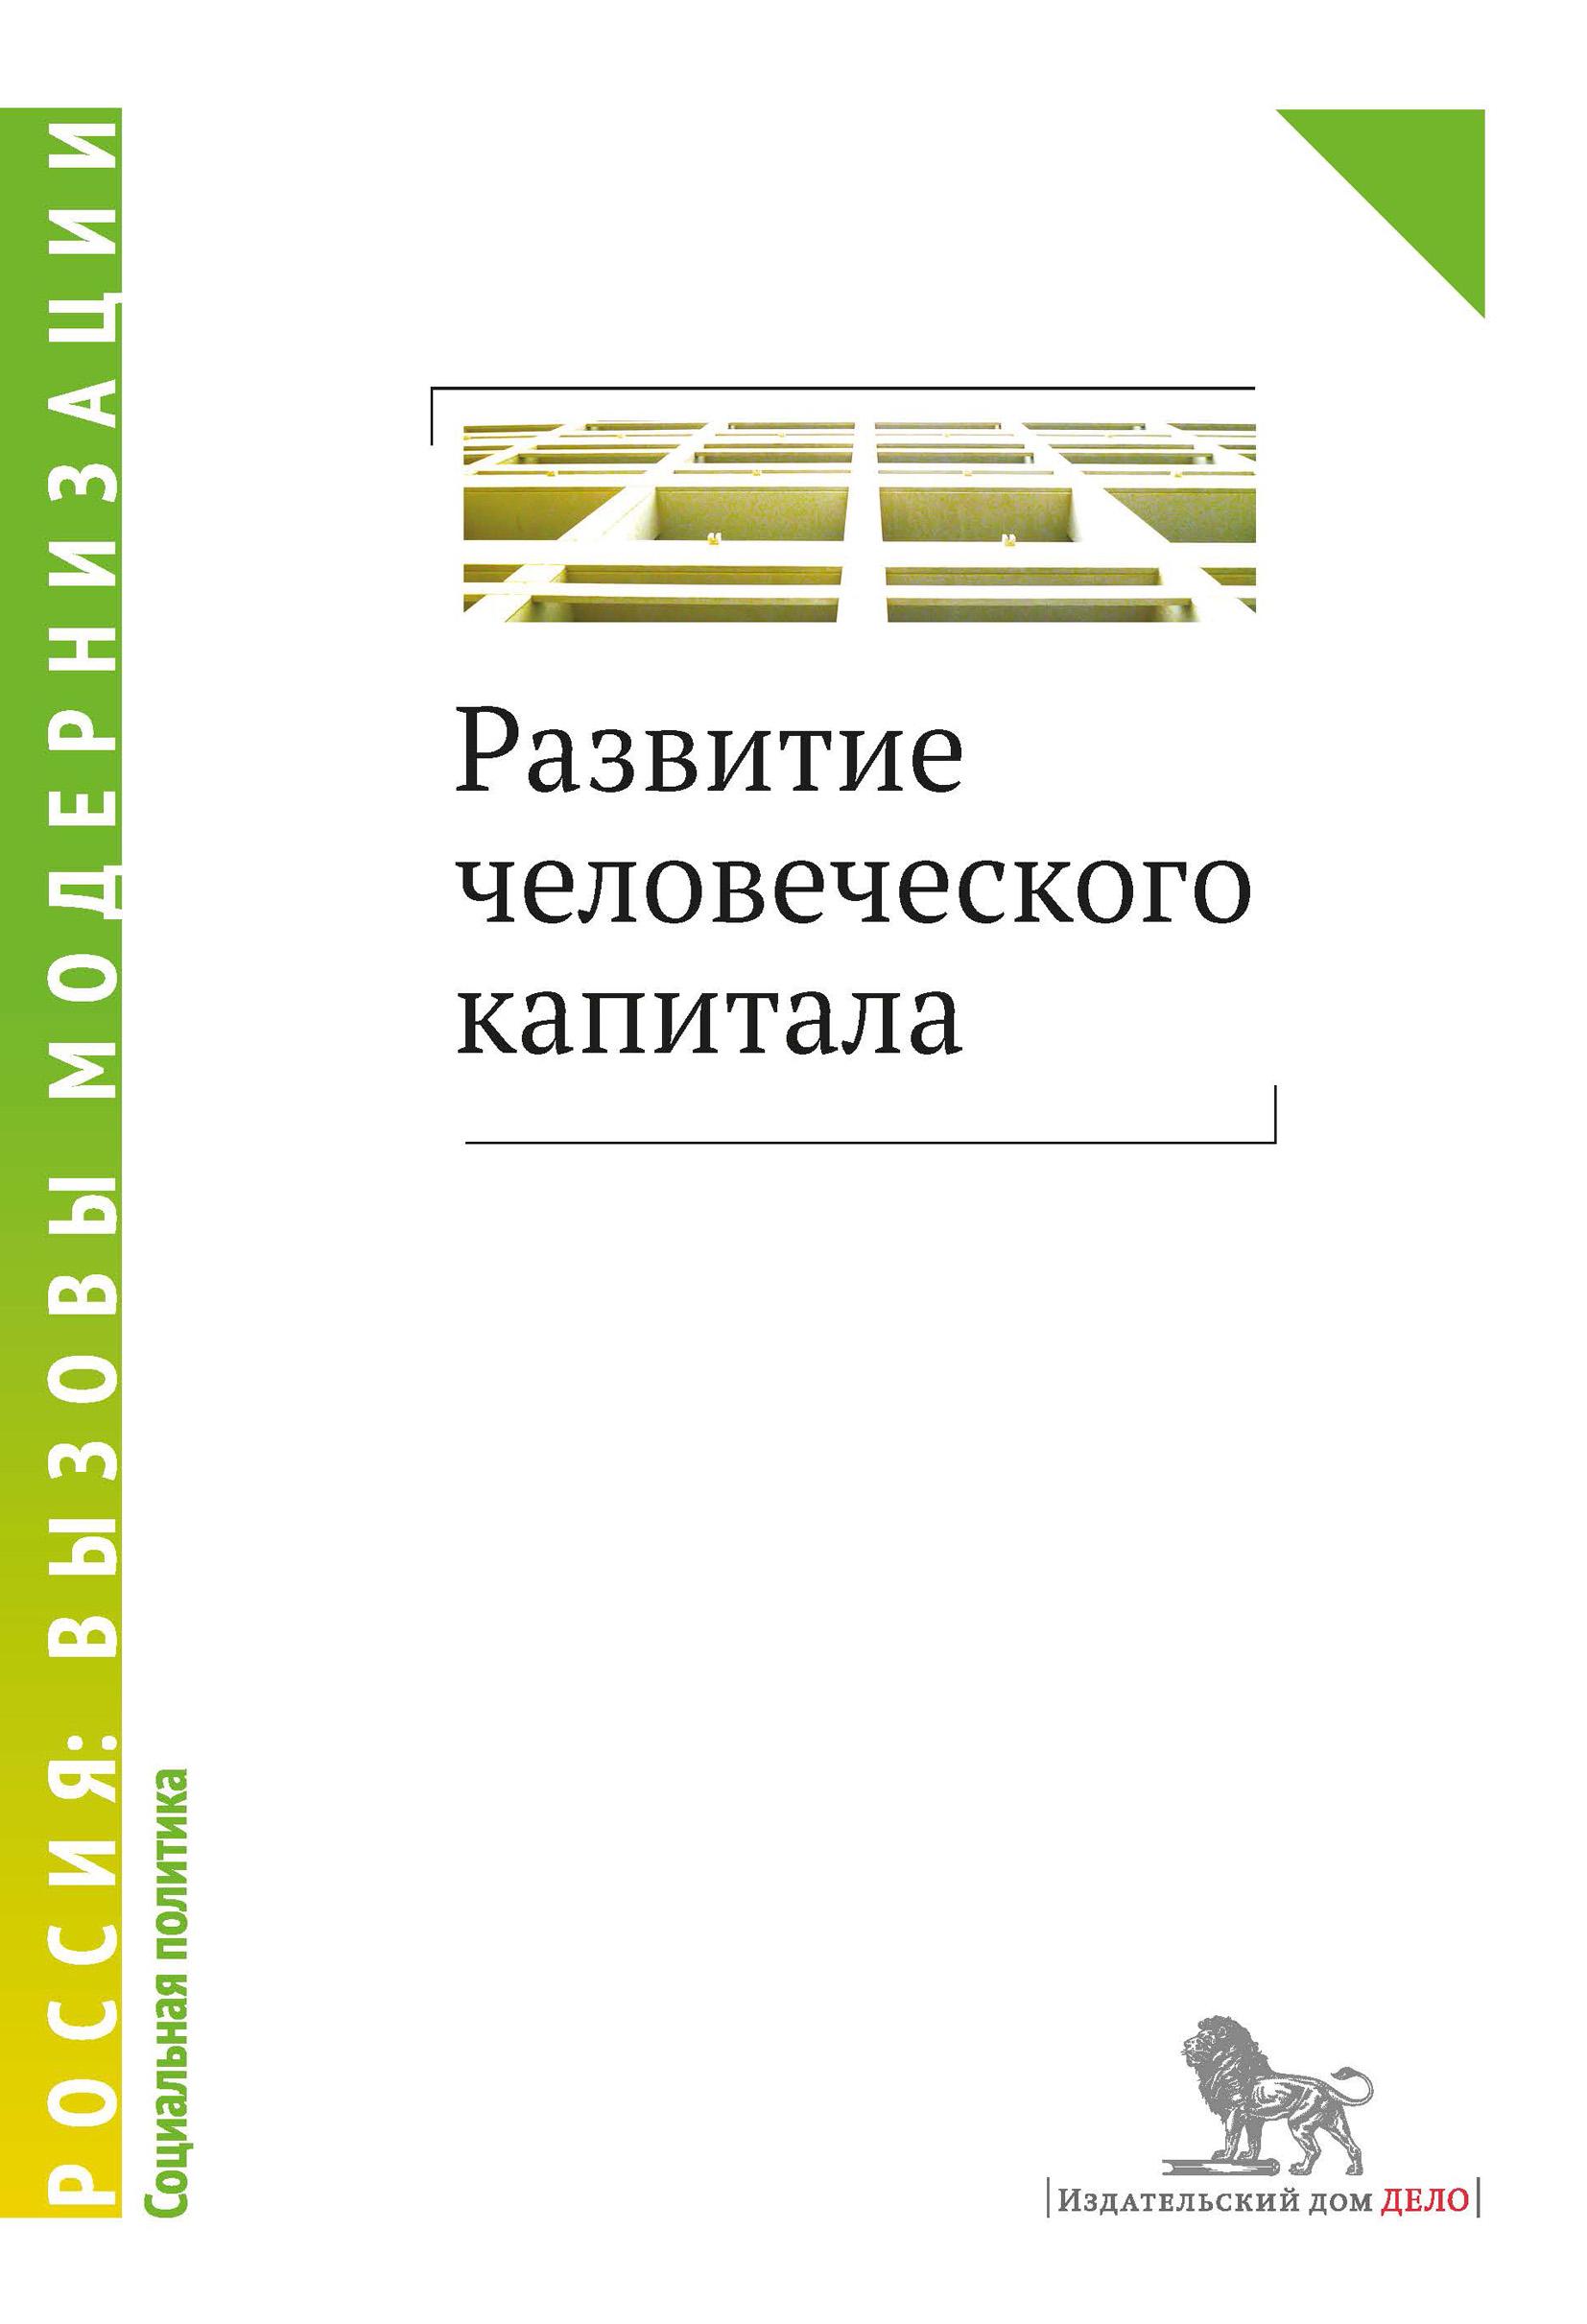 фото обложки издания Развитие человеческого капитала